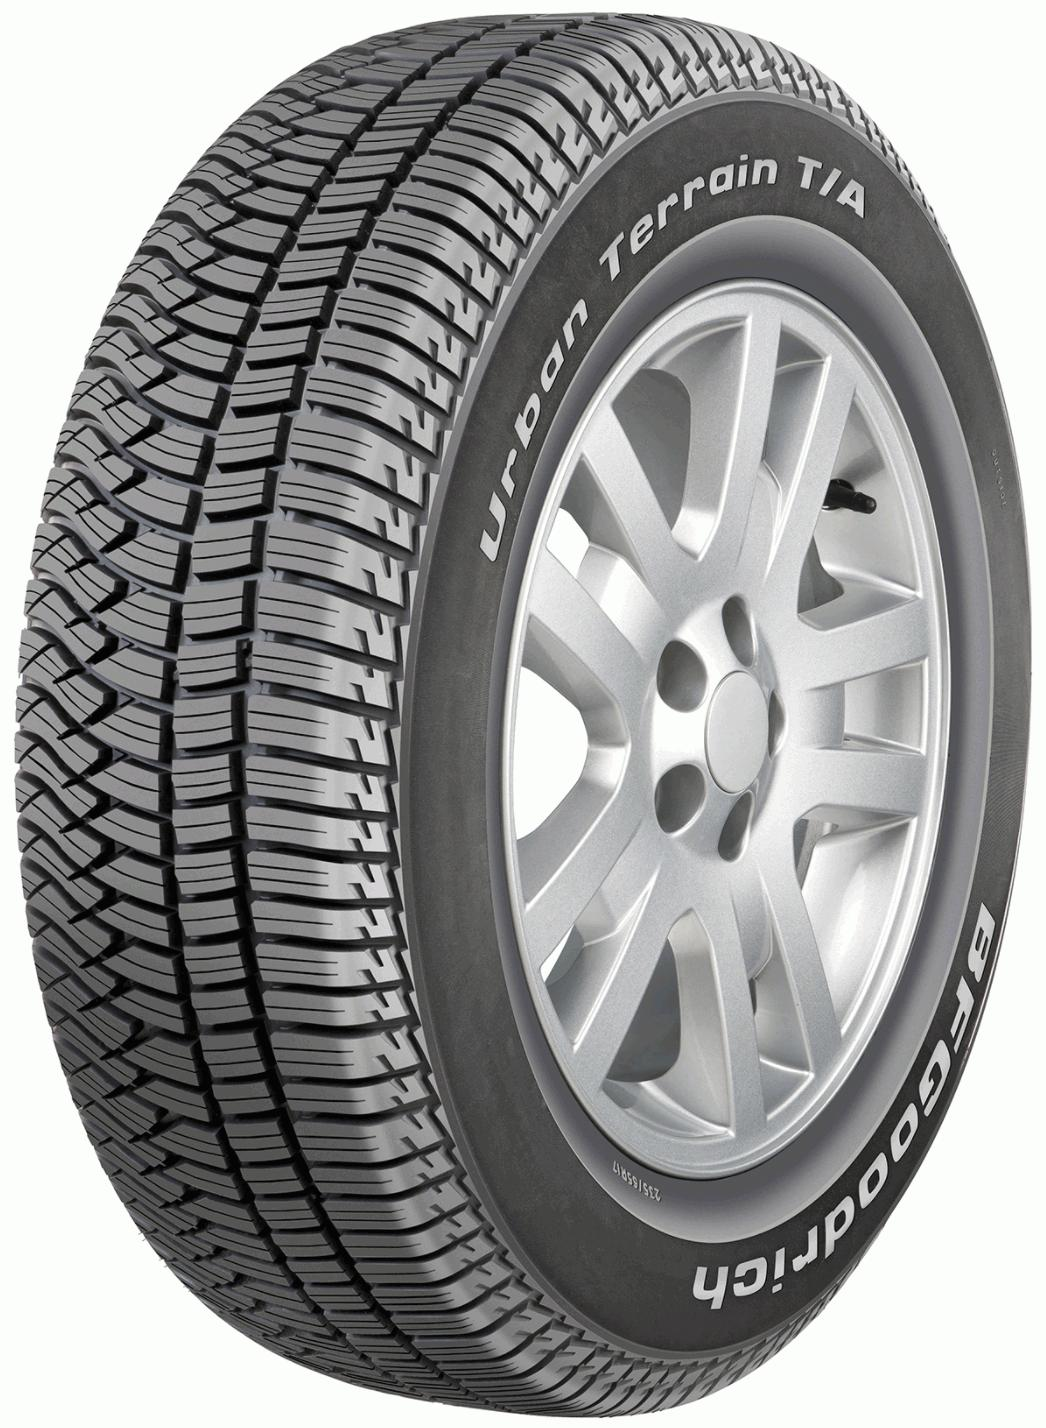 Passenger Car Summer Premium Touring Tyres Tyres Tyre Reviews